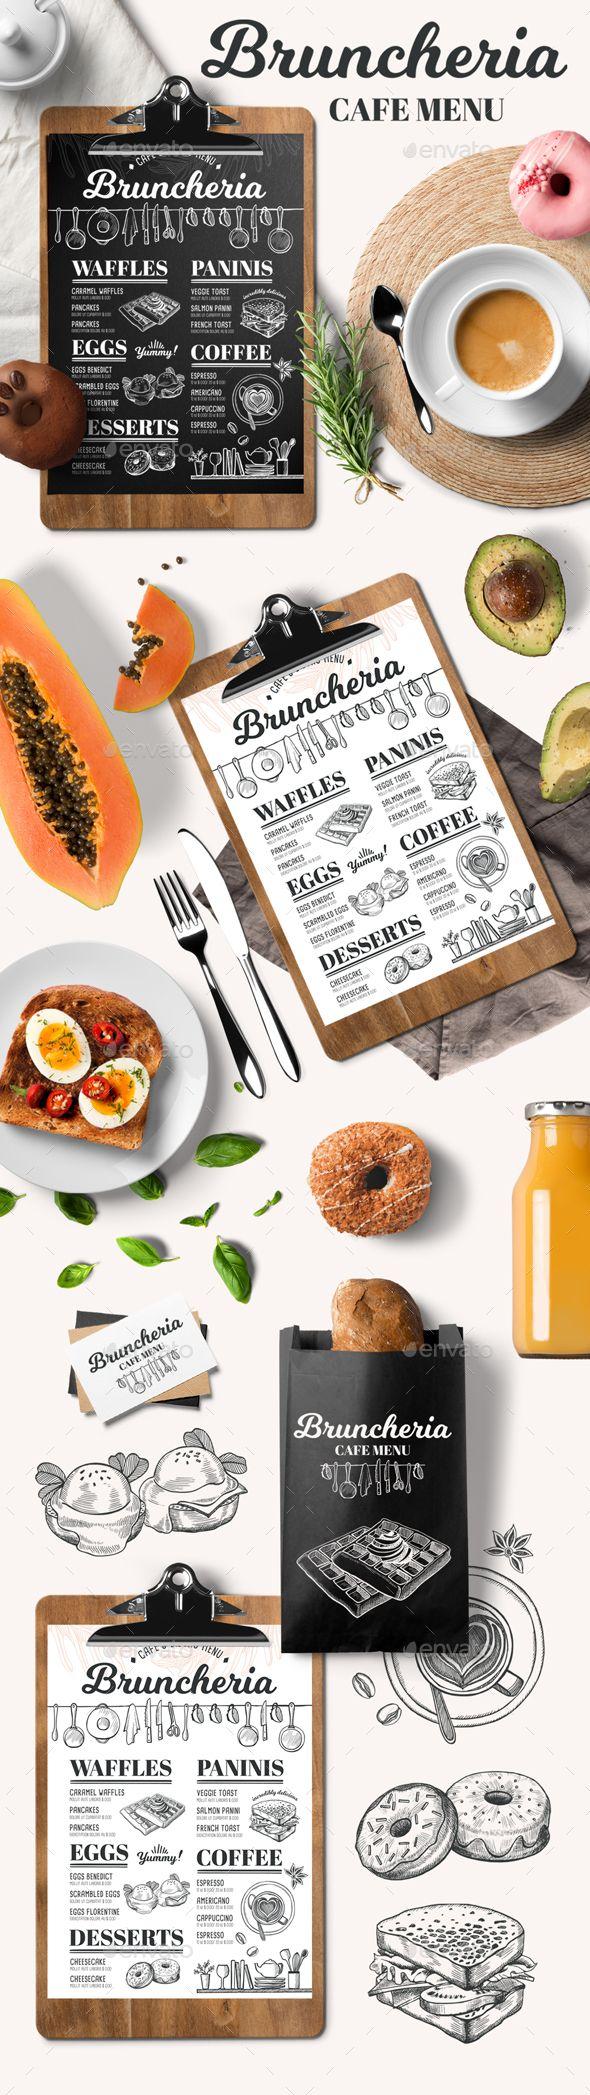 Brunch Menu Template — Photoshop PSD #hand-drawing doodle #food menu • Download ➝ https://graphicriver.net/item/brunch-menu-template/19523421?ref=pxcr